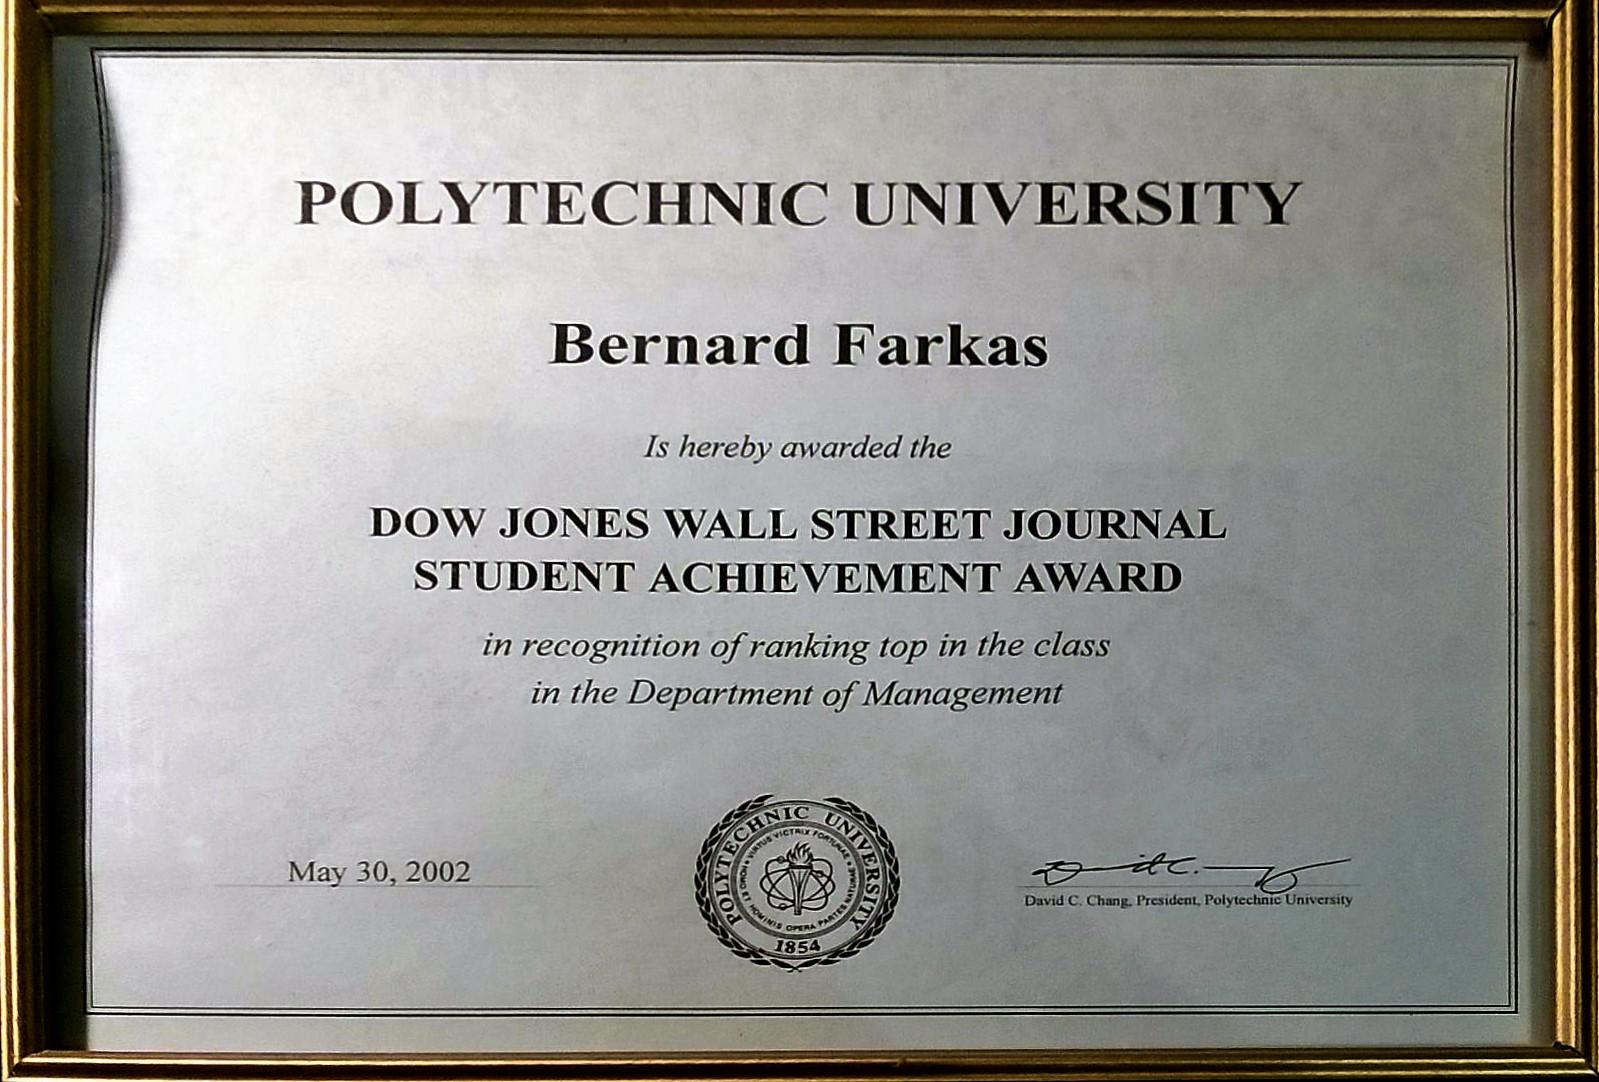 Polytechnic University